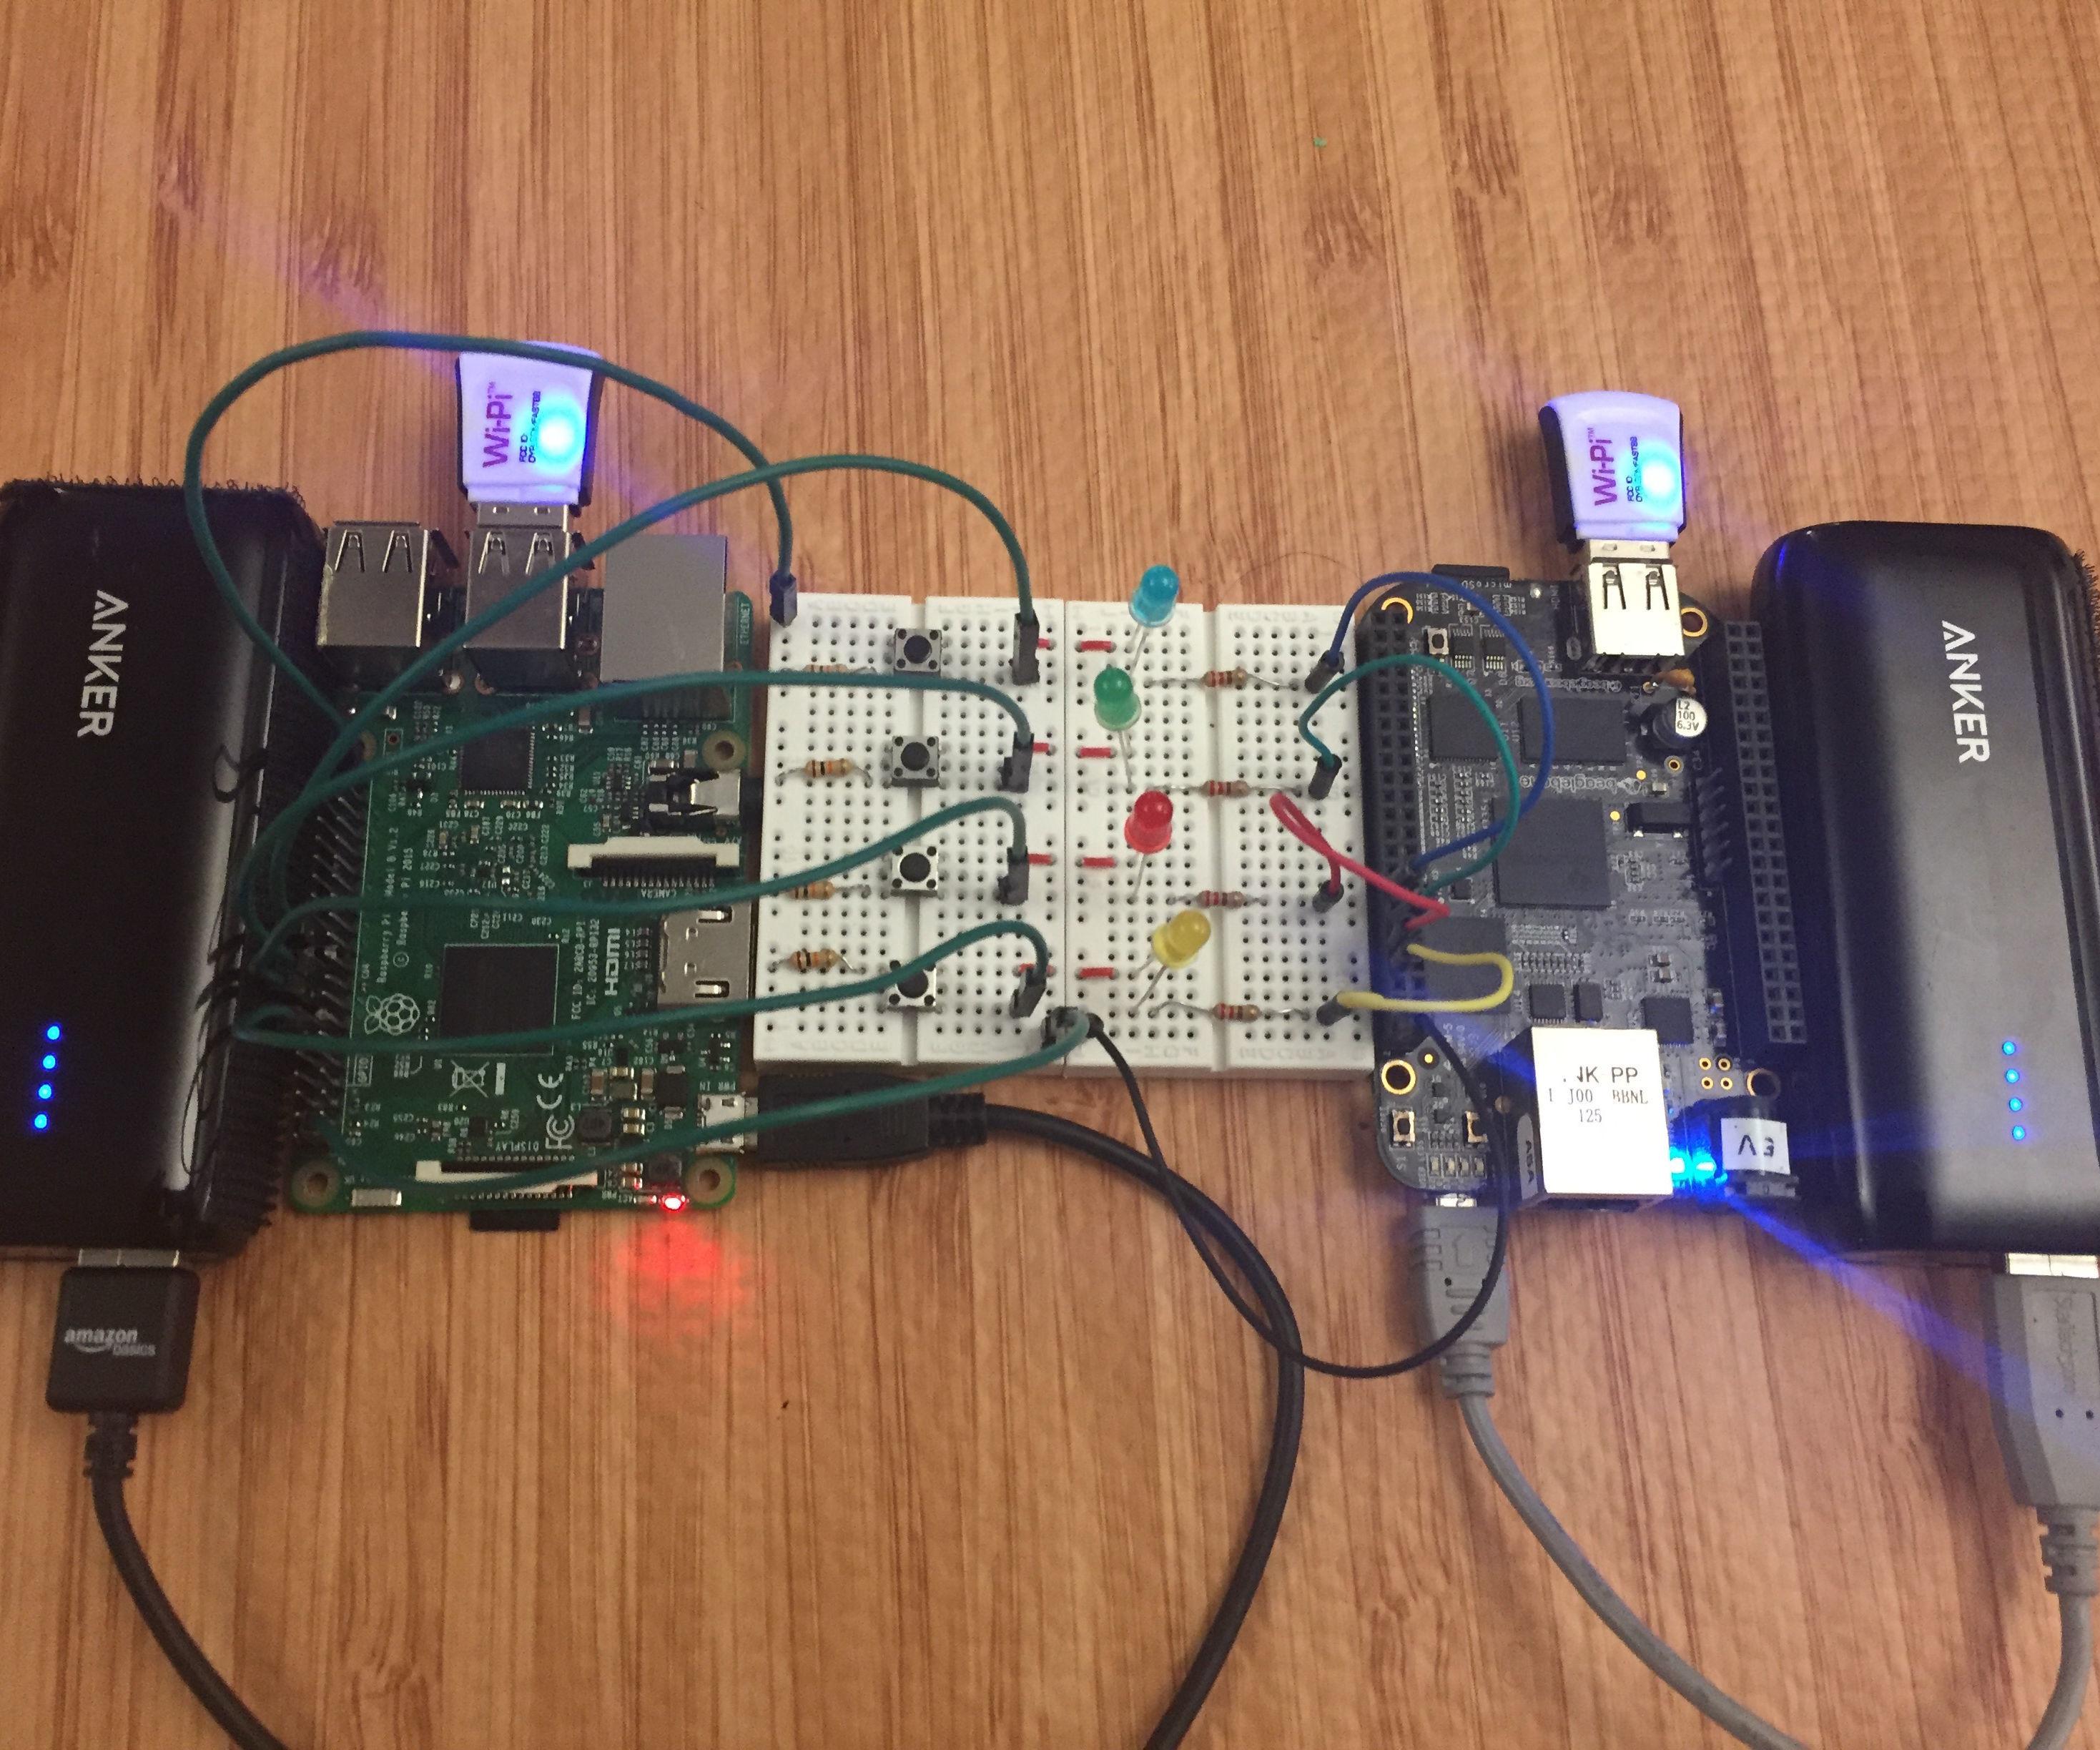 Using a Raspberry Pi to Control a BeagleBone Black over Wi-Fi